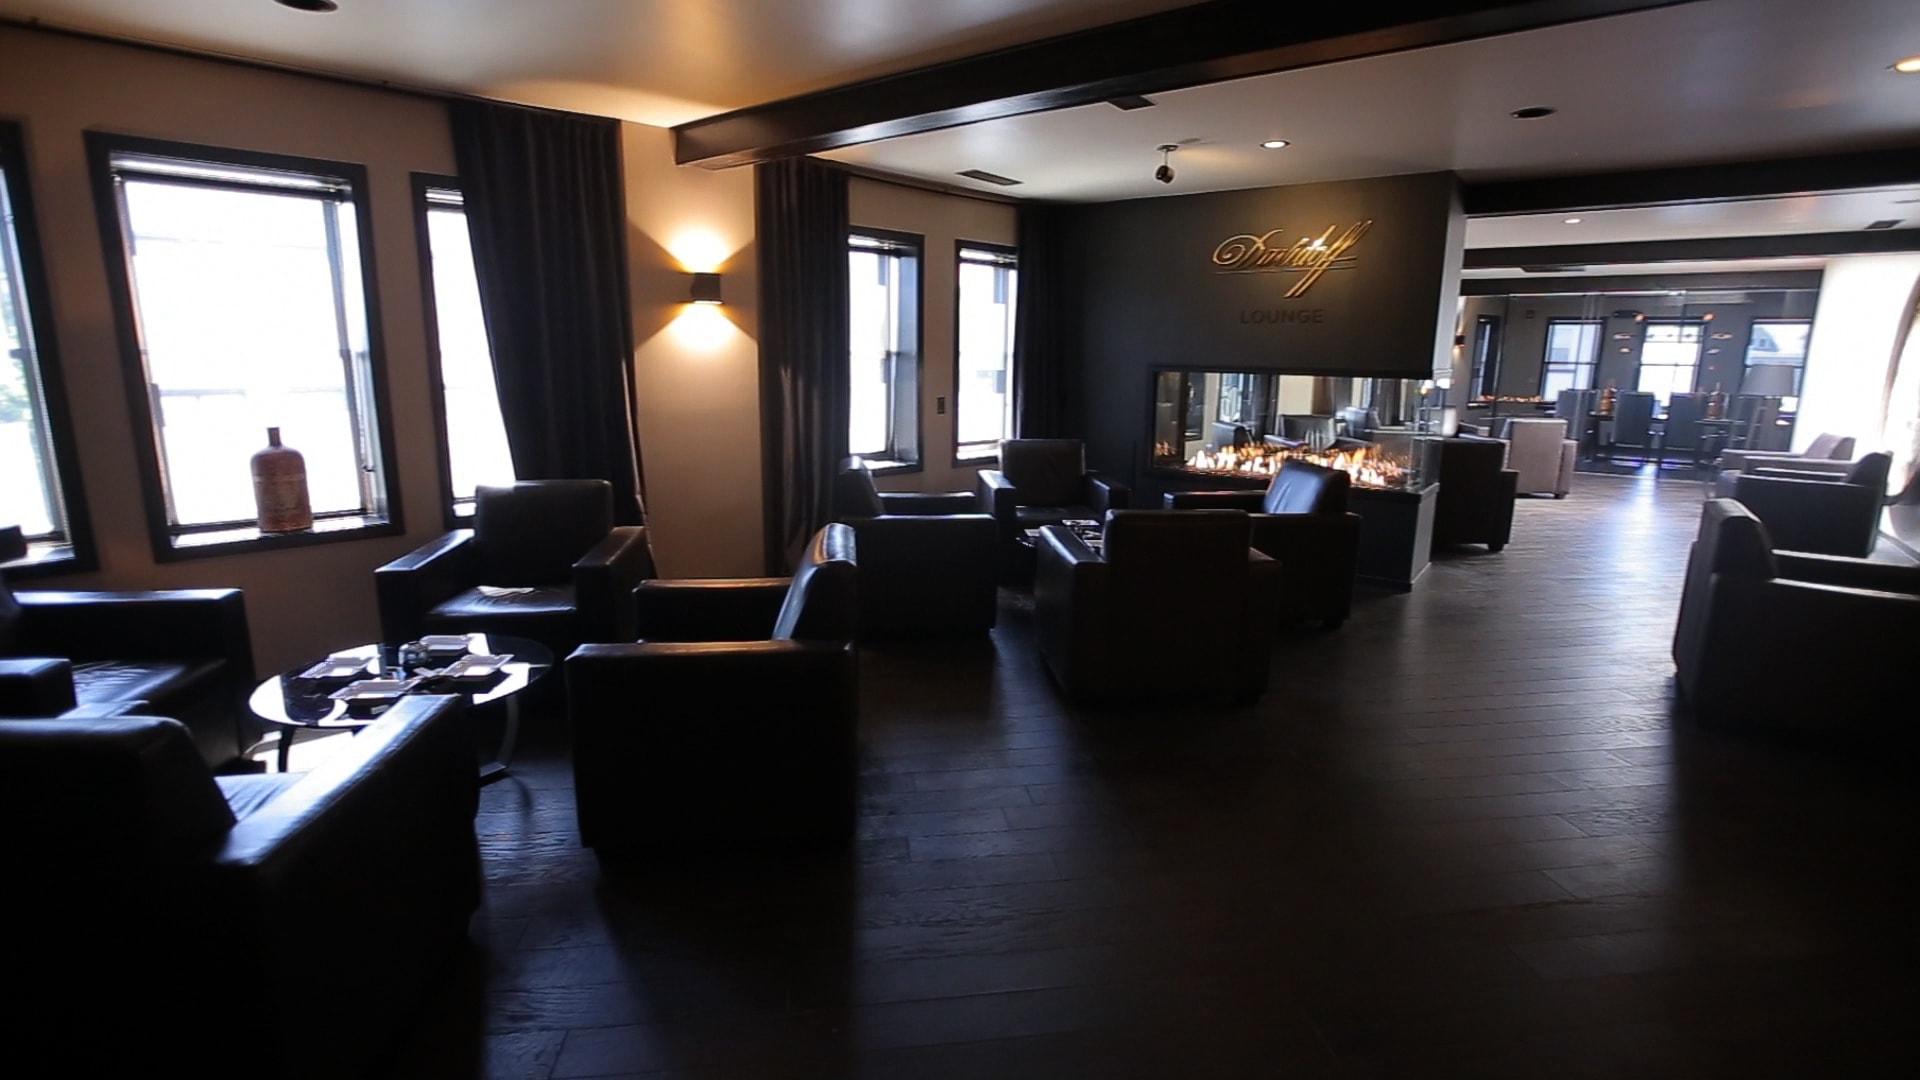 Davidoff Lounge in The Tobacco Shop of Ridgewood-min.jpg